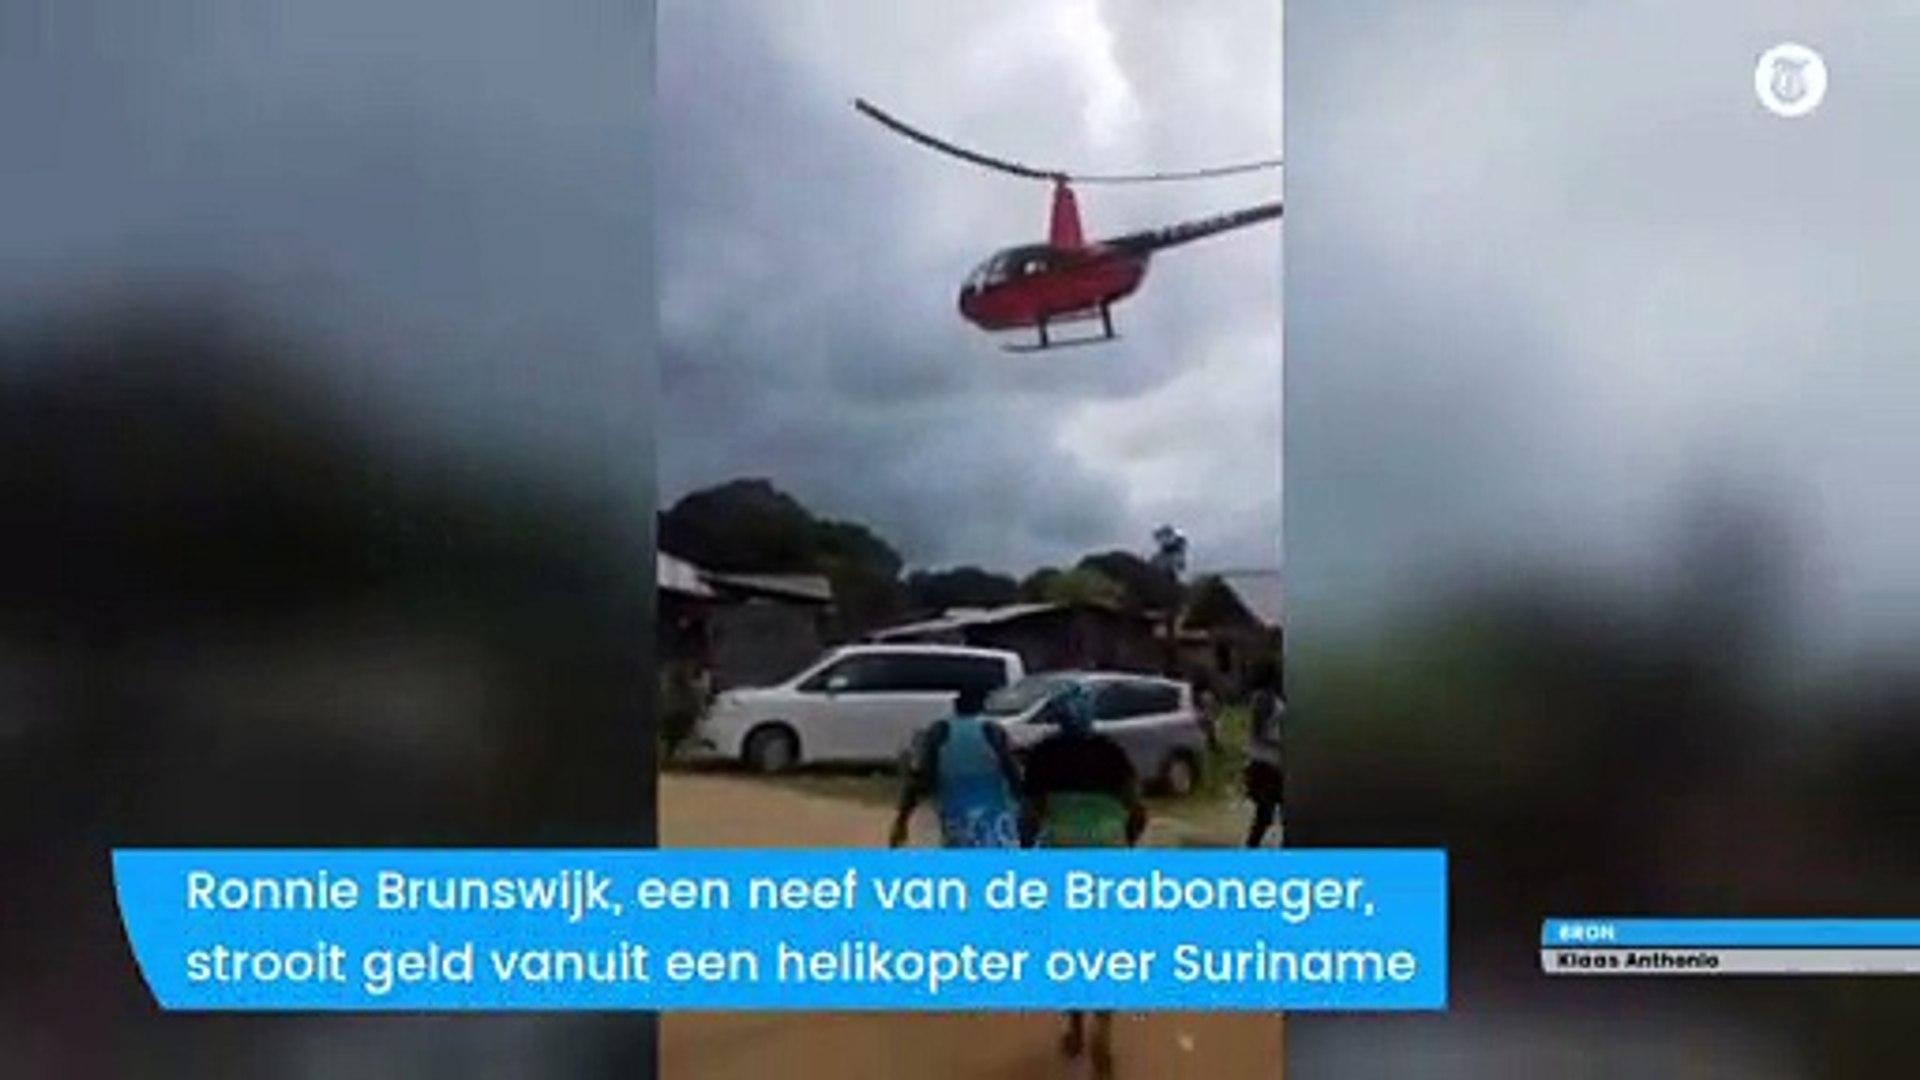 Surinaamse politicus strooit met geld uit helikopter